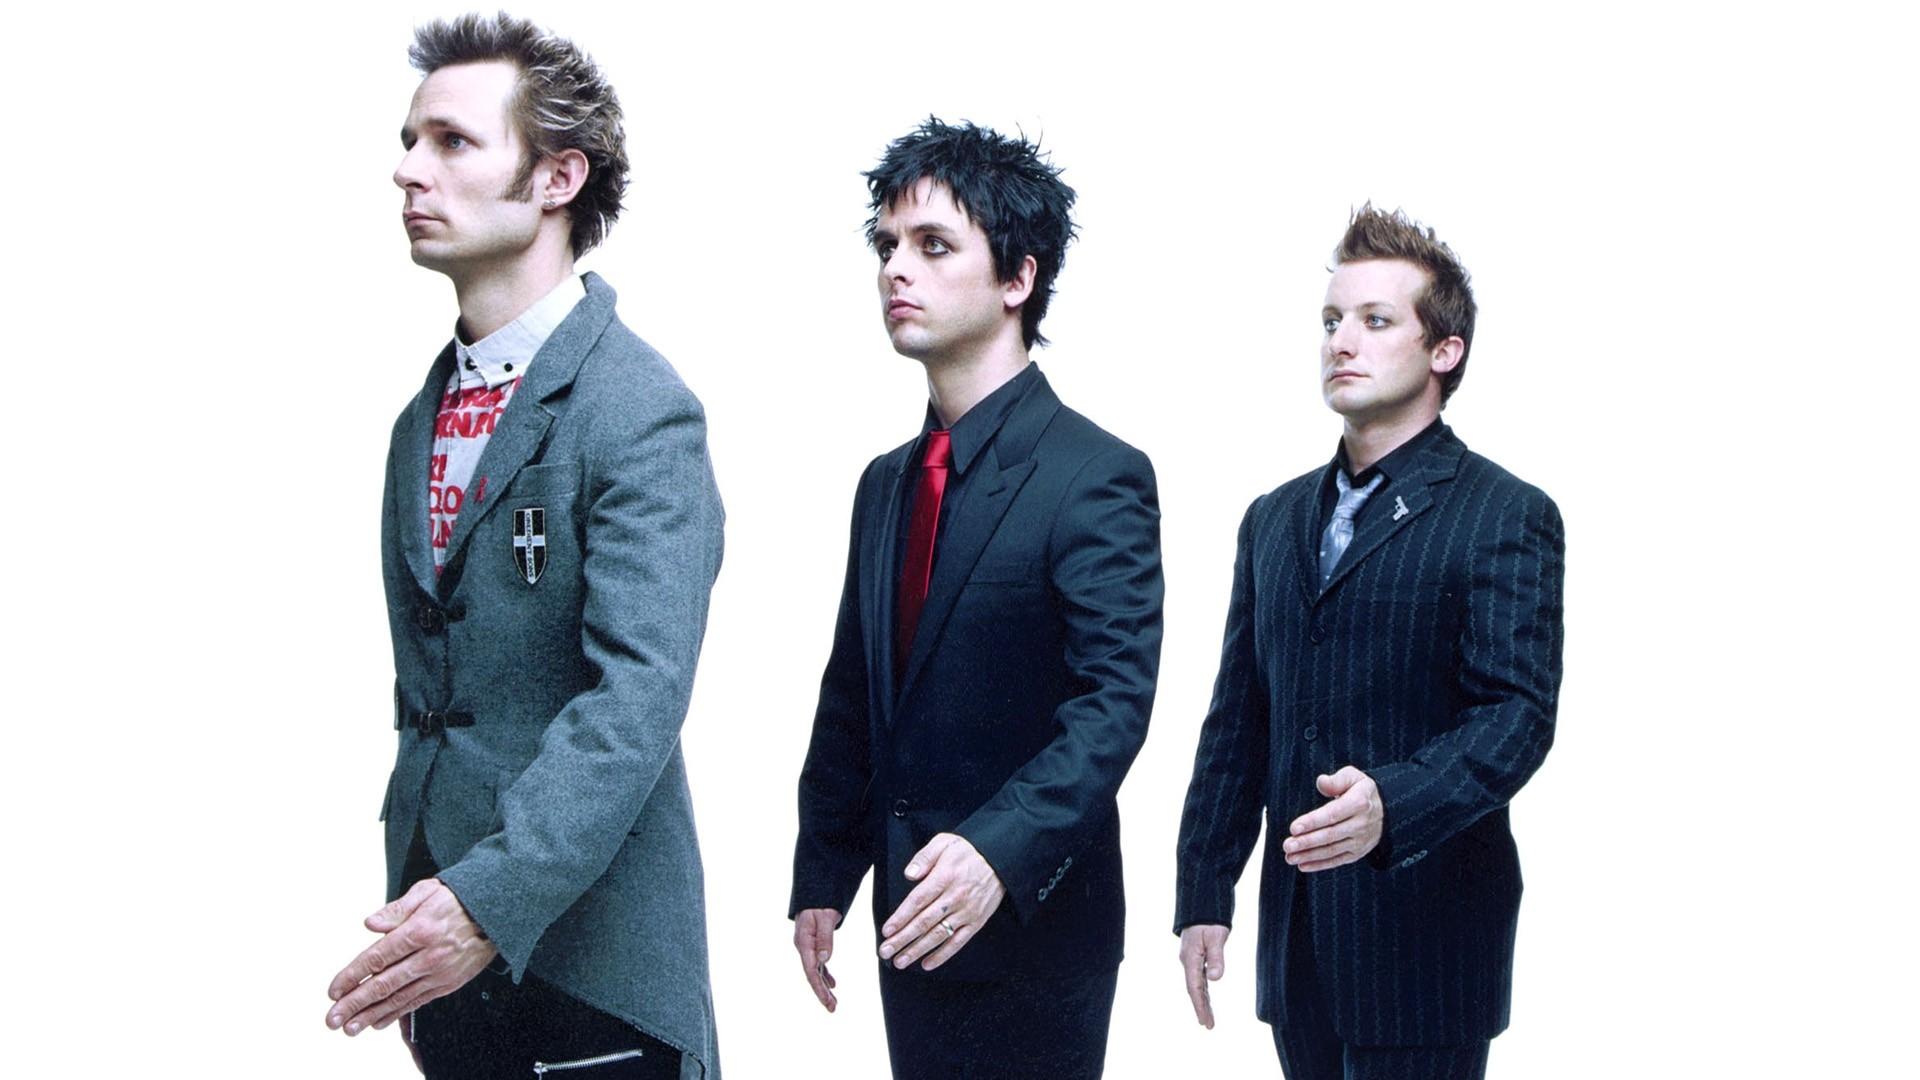 Green Day Wallpaper image hd